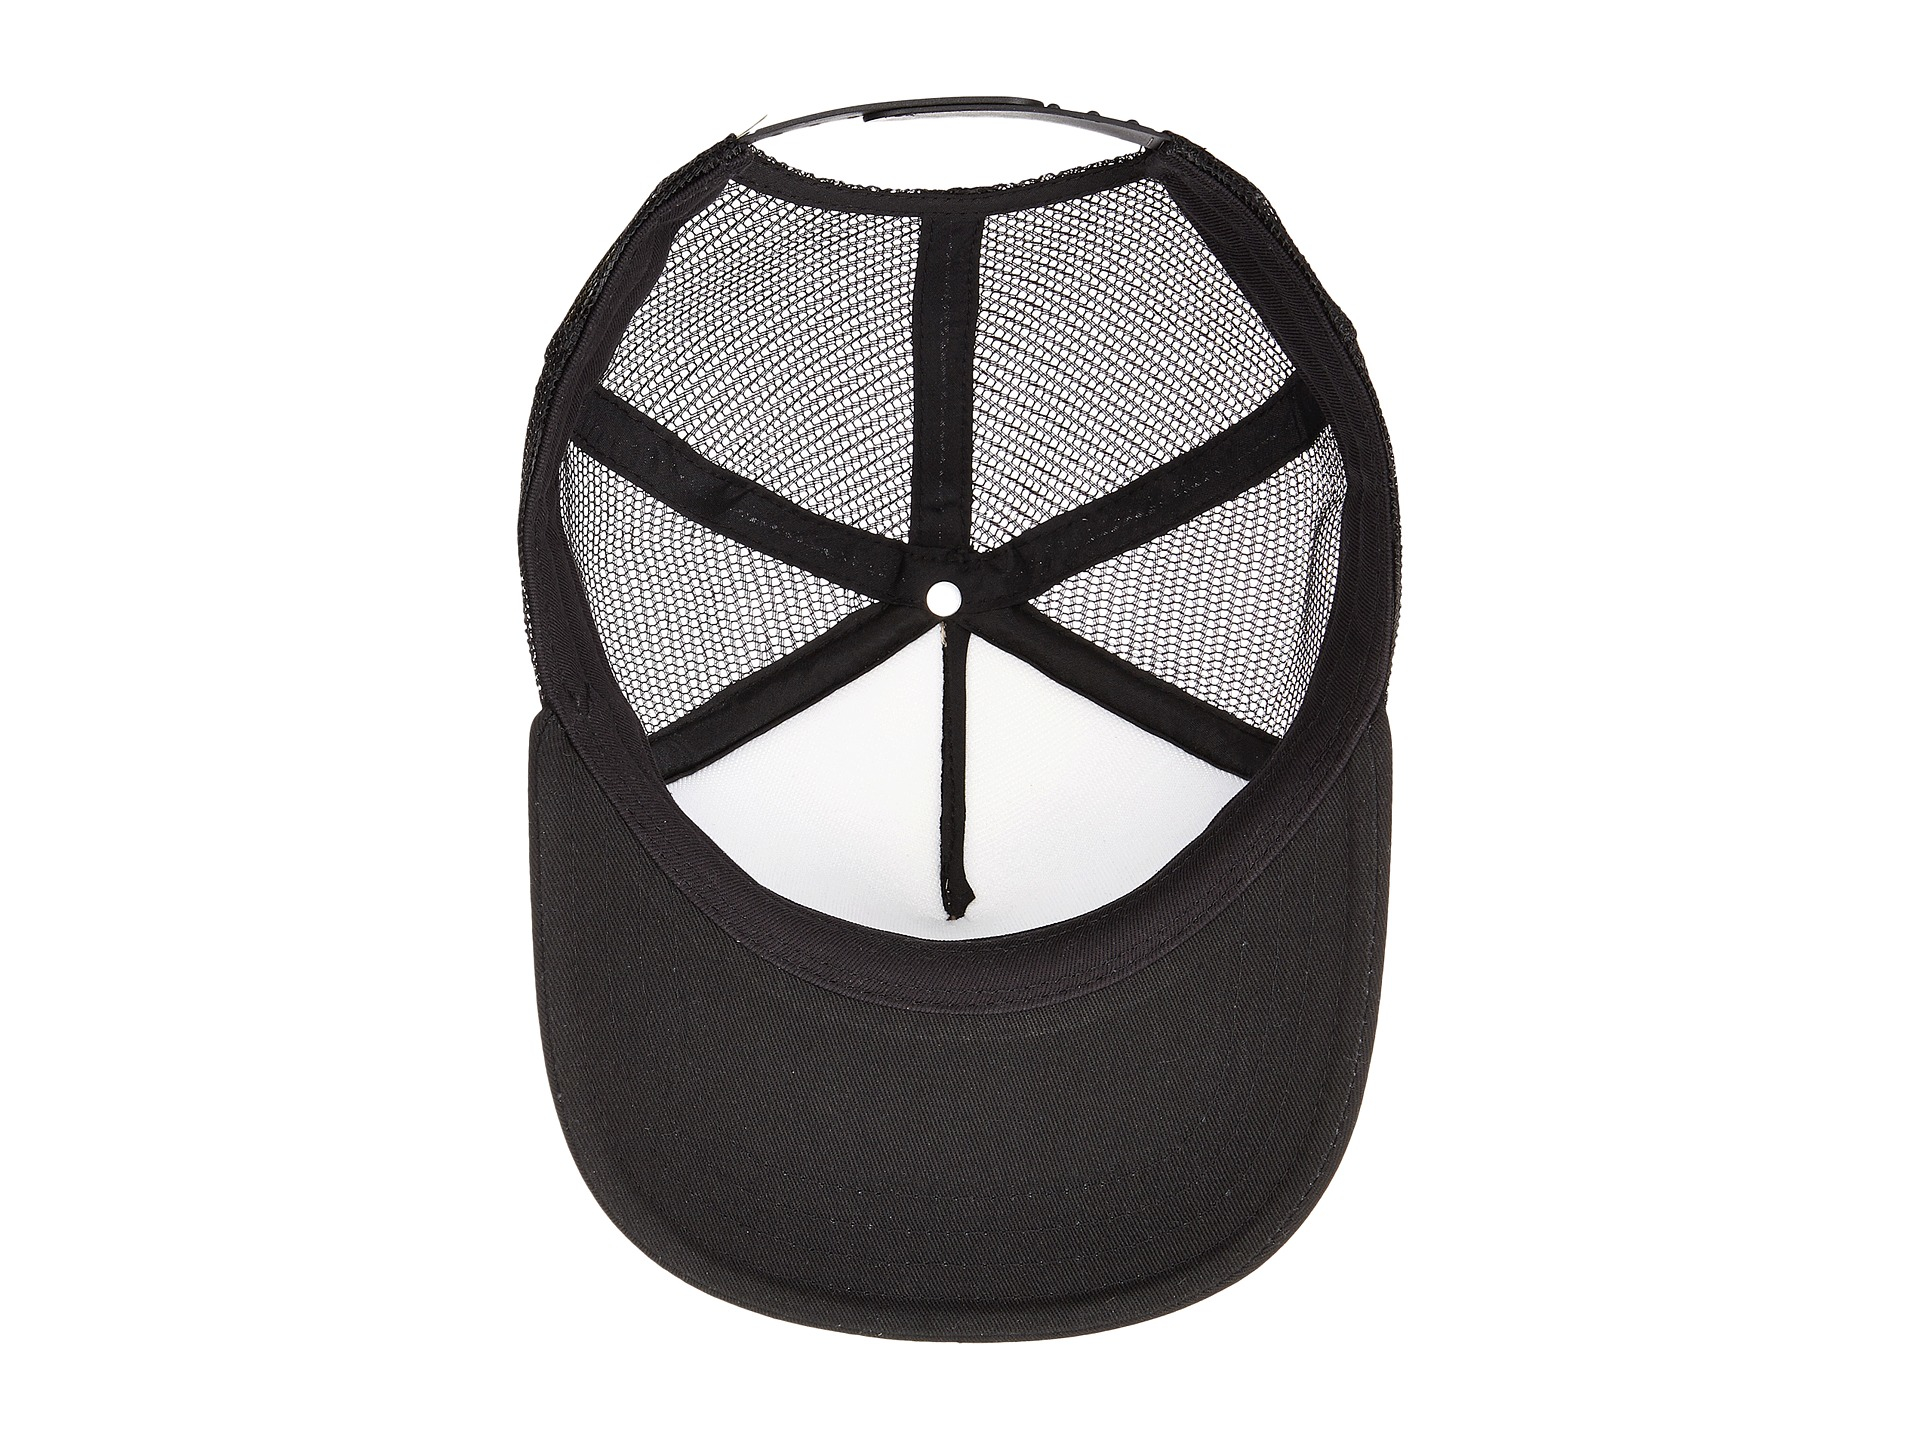 da35d77daa100 Vans Beach Girl Trucker Hat in Black - Lyst